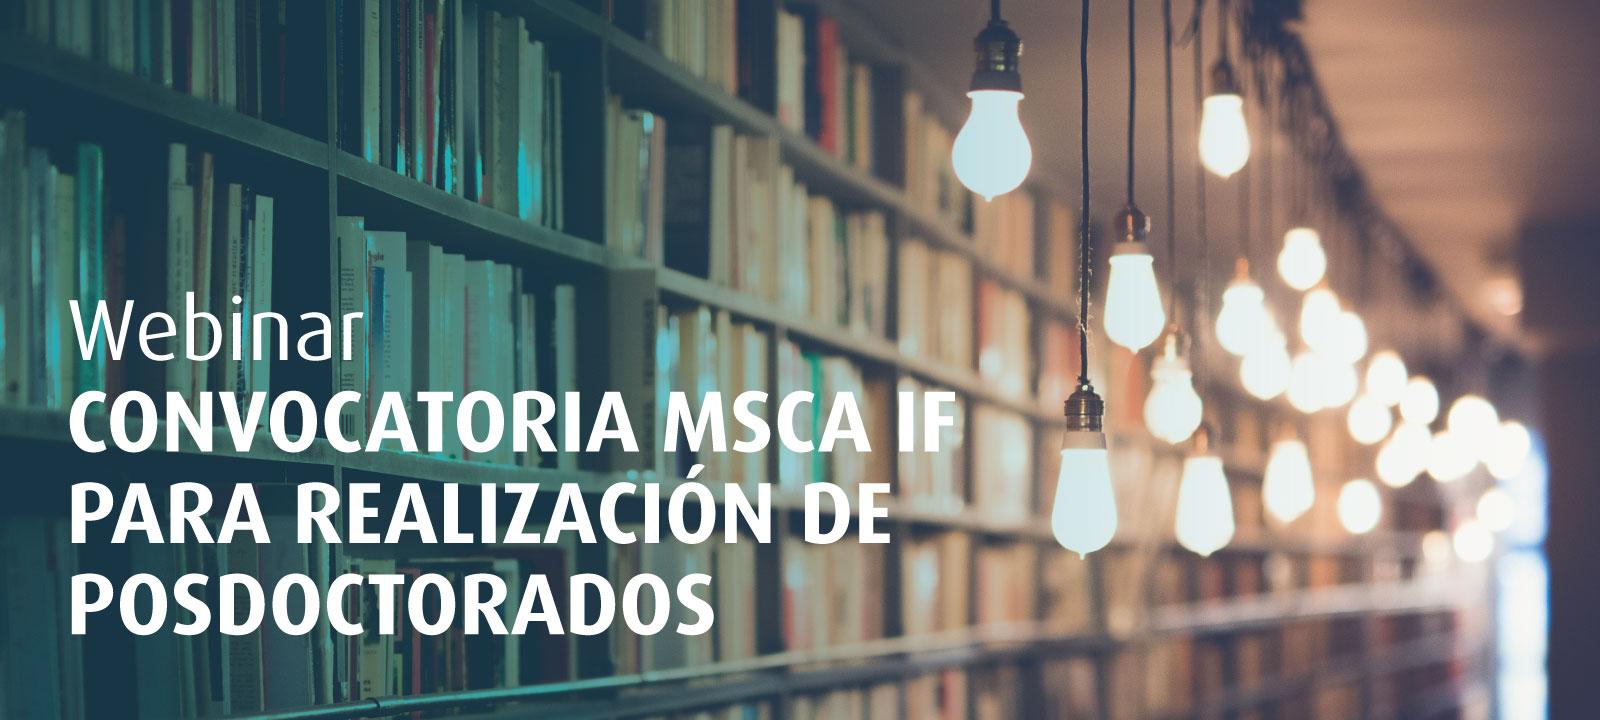 Webinar Convocatoria MSCA IF para realización de posdoctorados